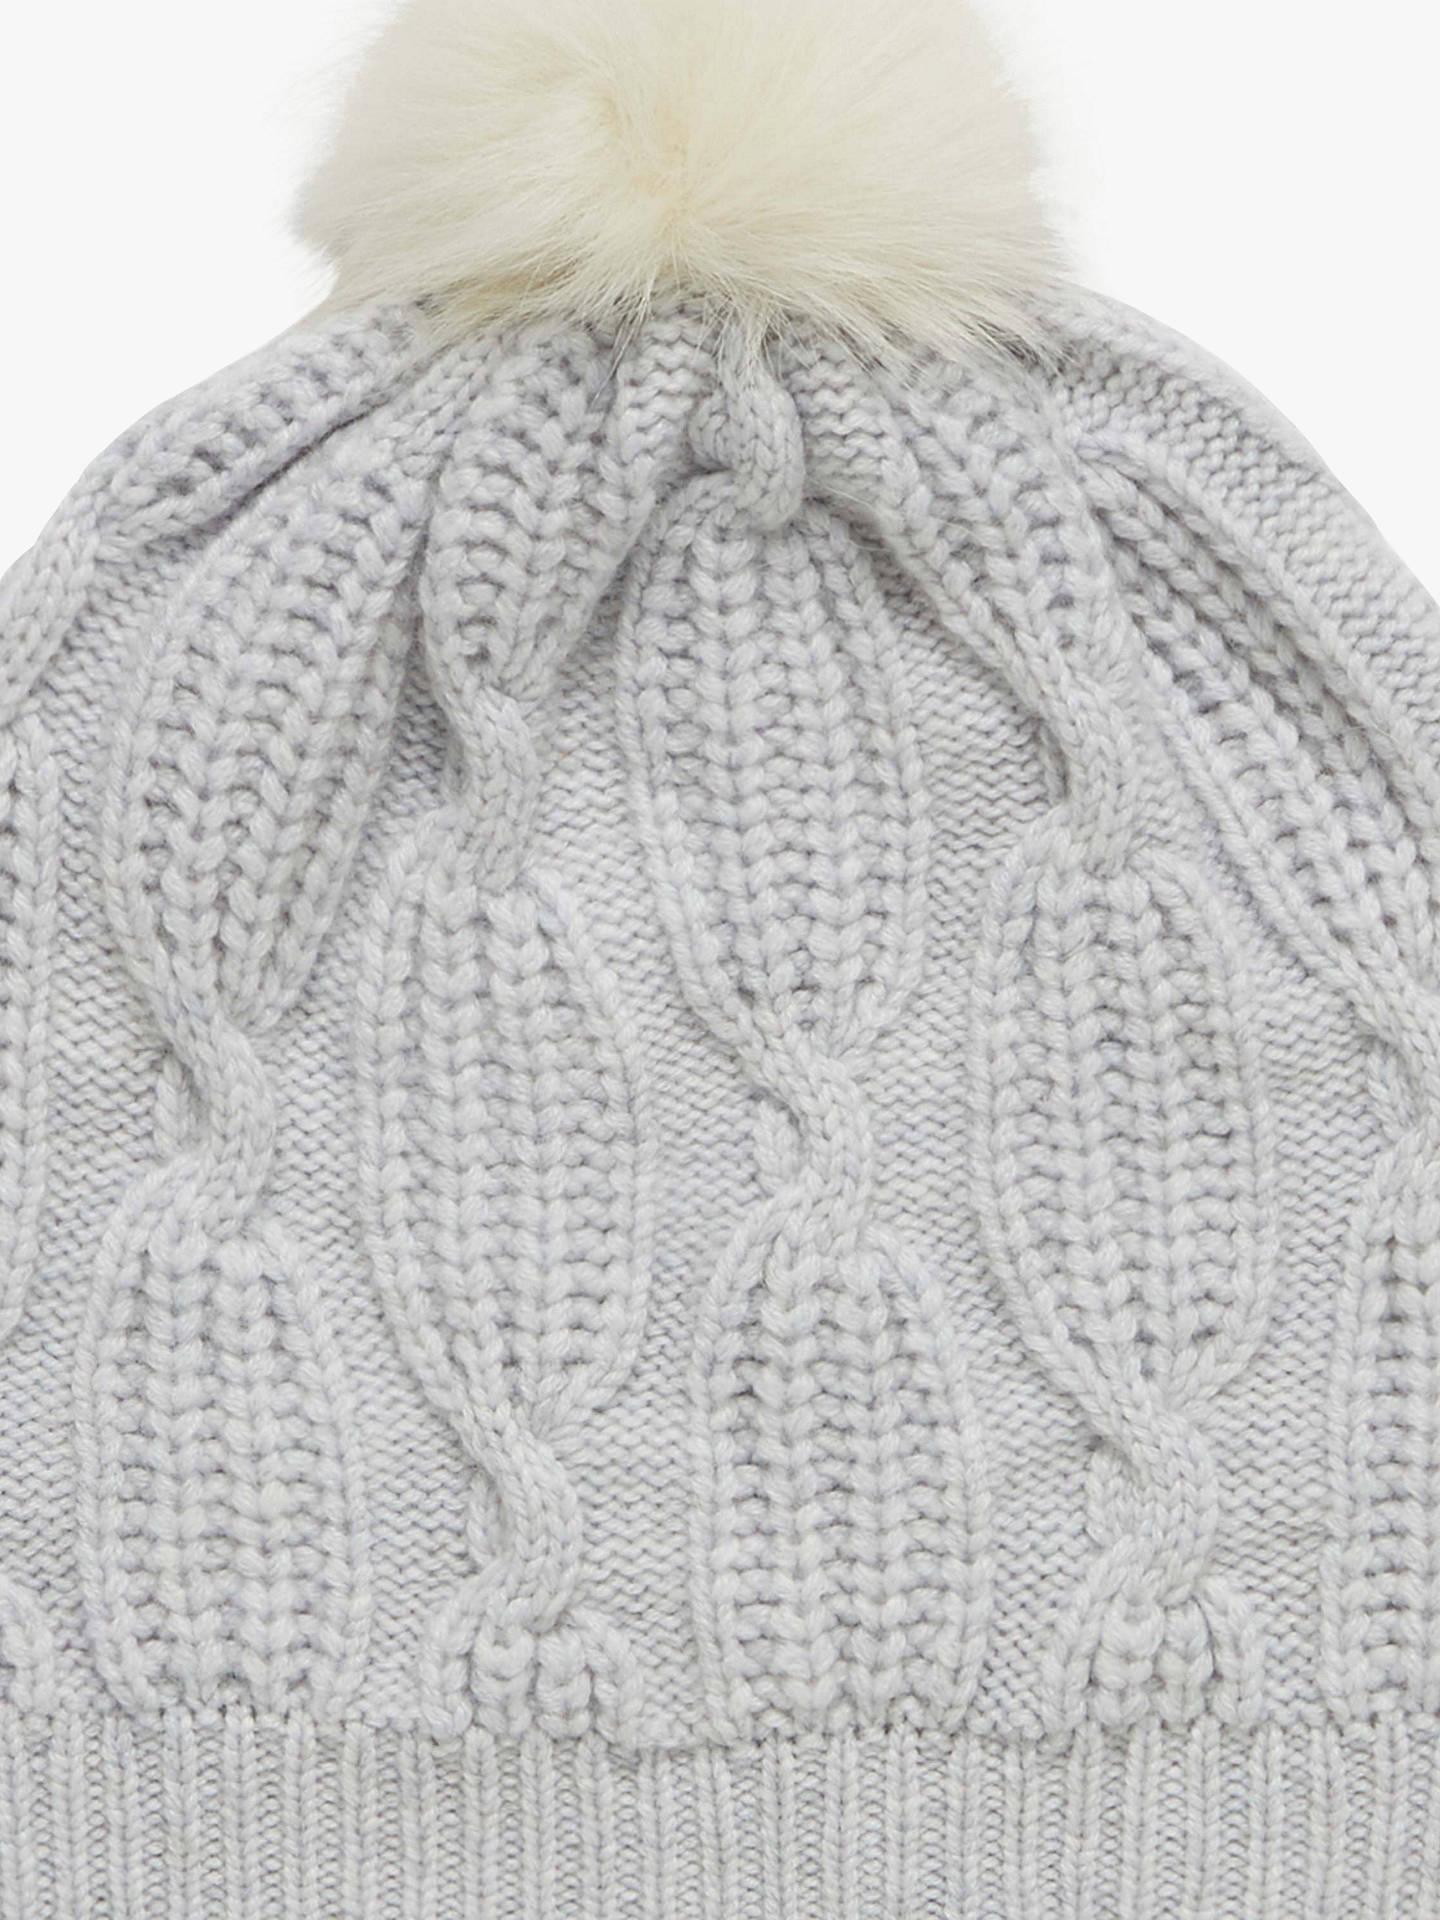 3bd89ebc080422 ... Buy Brora Cashmere Knit Pom-Pom Beanie Hat, Pearl, One Size Online at